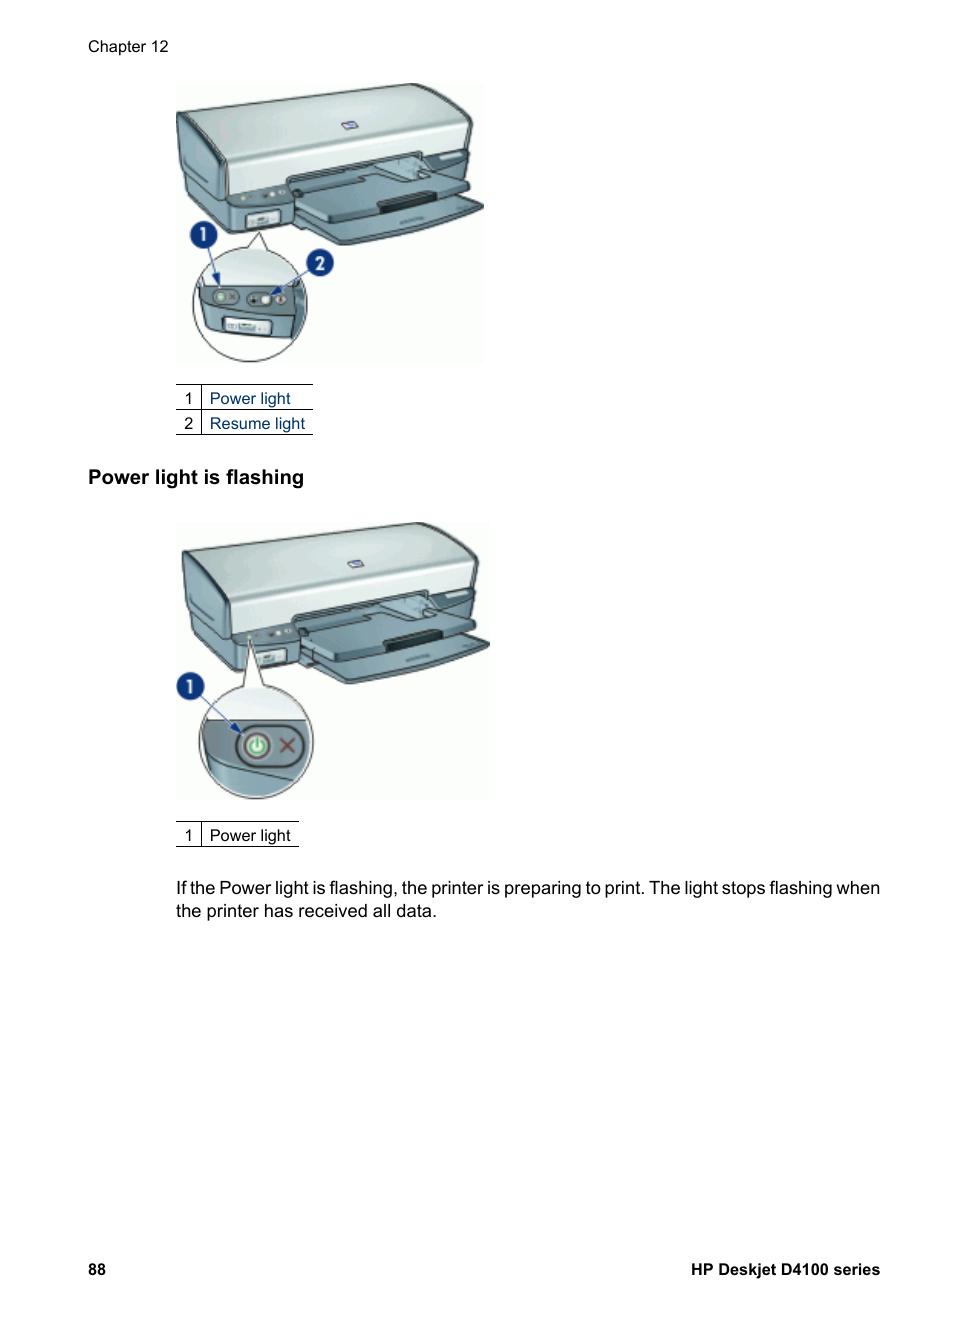 hp d4100 manual how to and user guide instructions u2022 rh taxibermuda co HP Printer User Manual hp d4100 printer manual